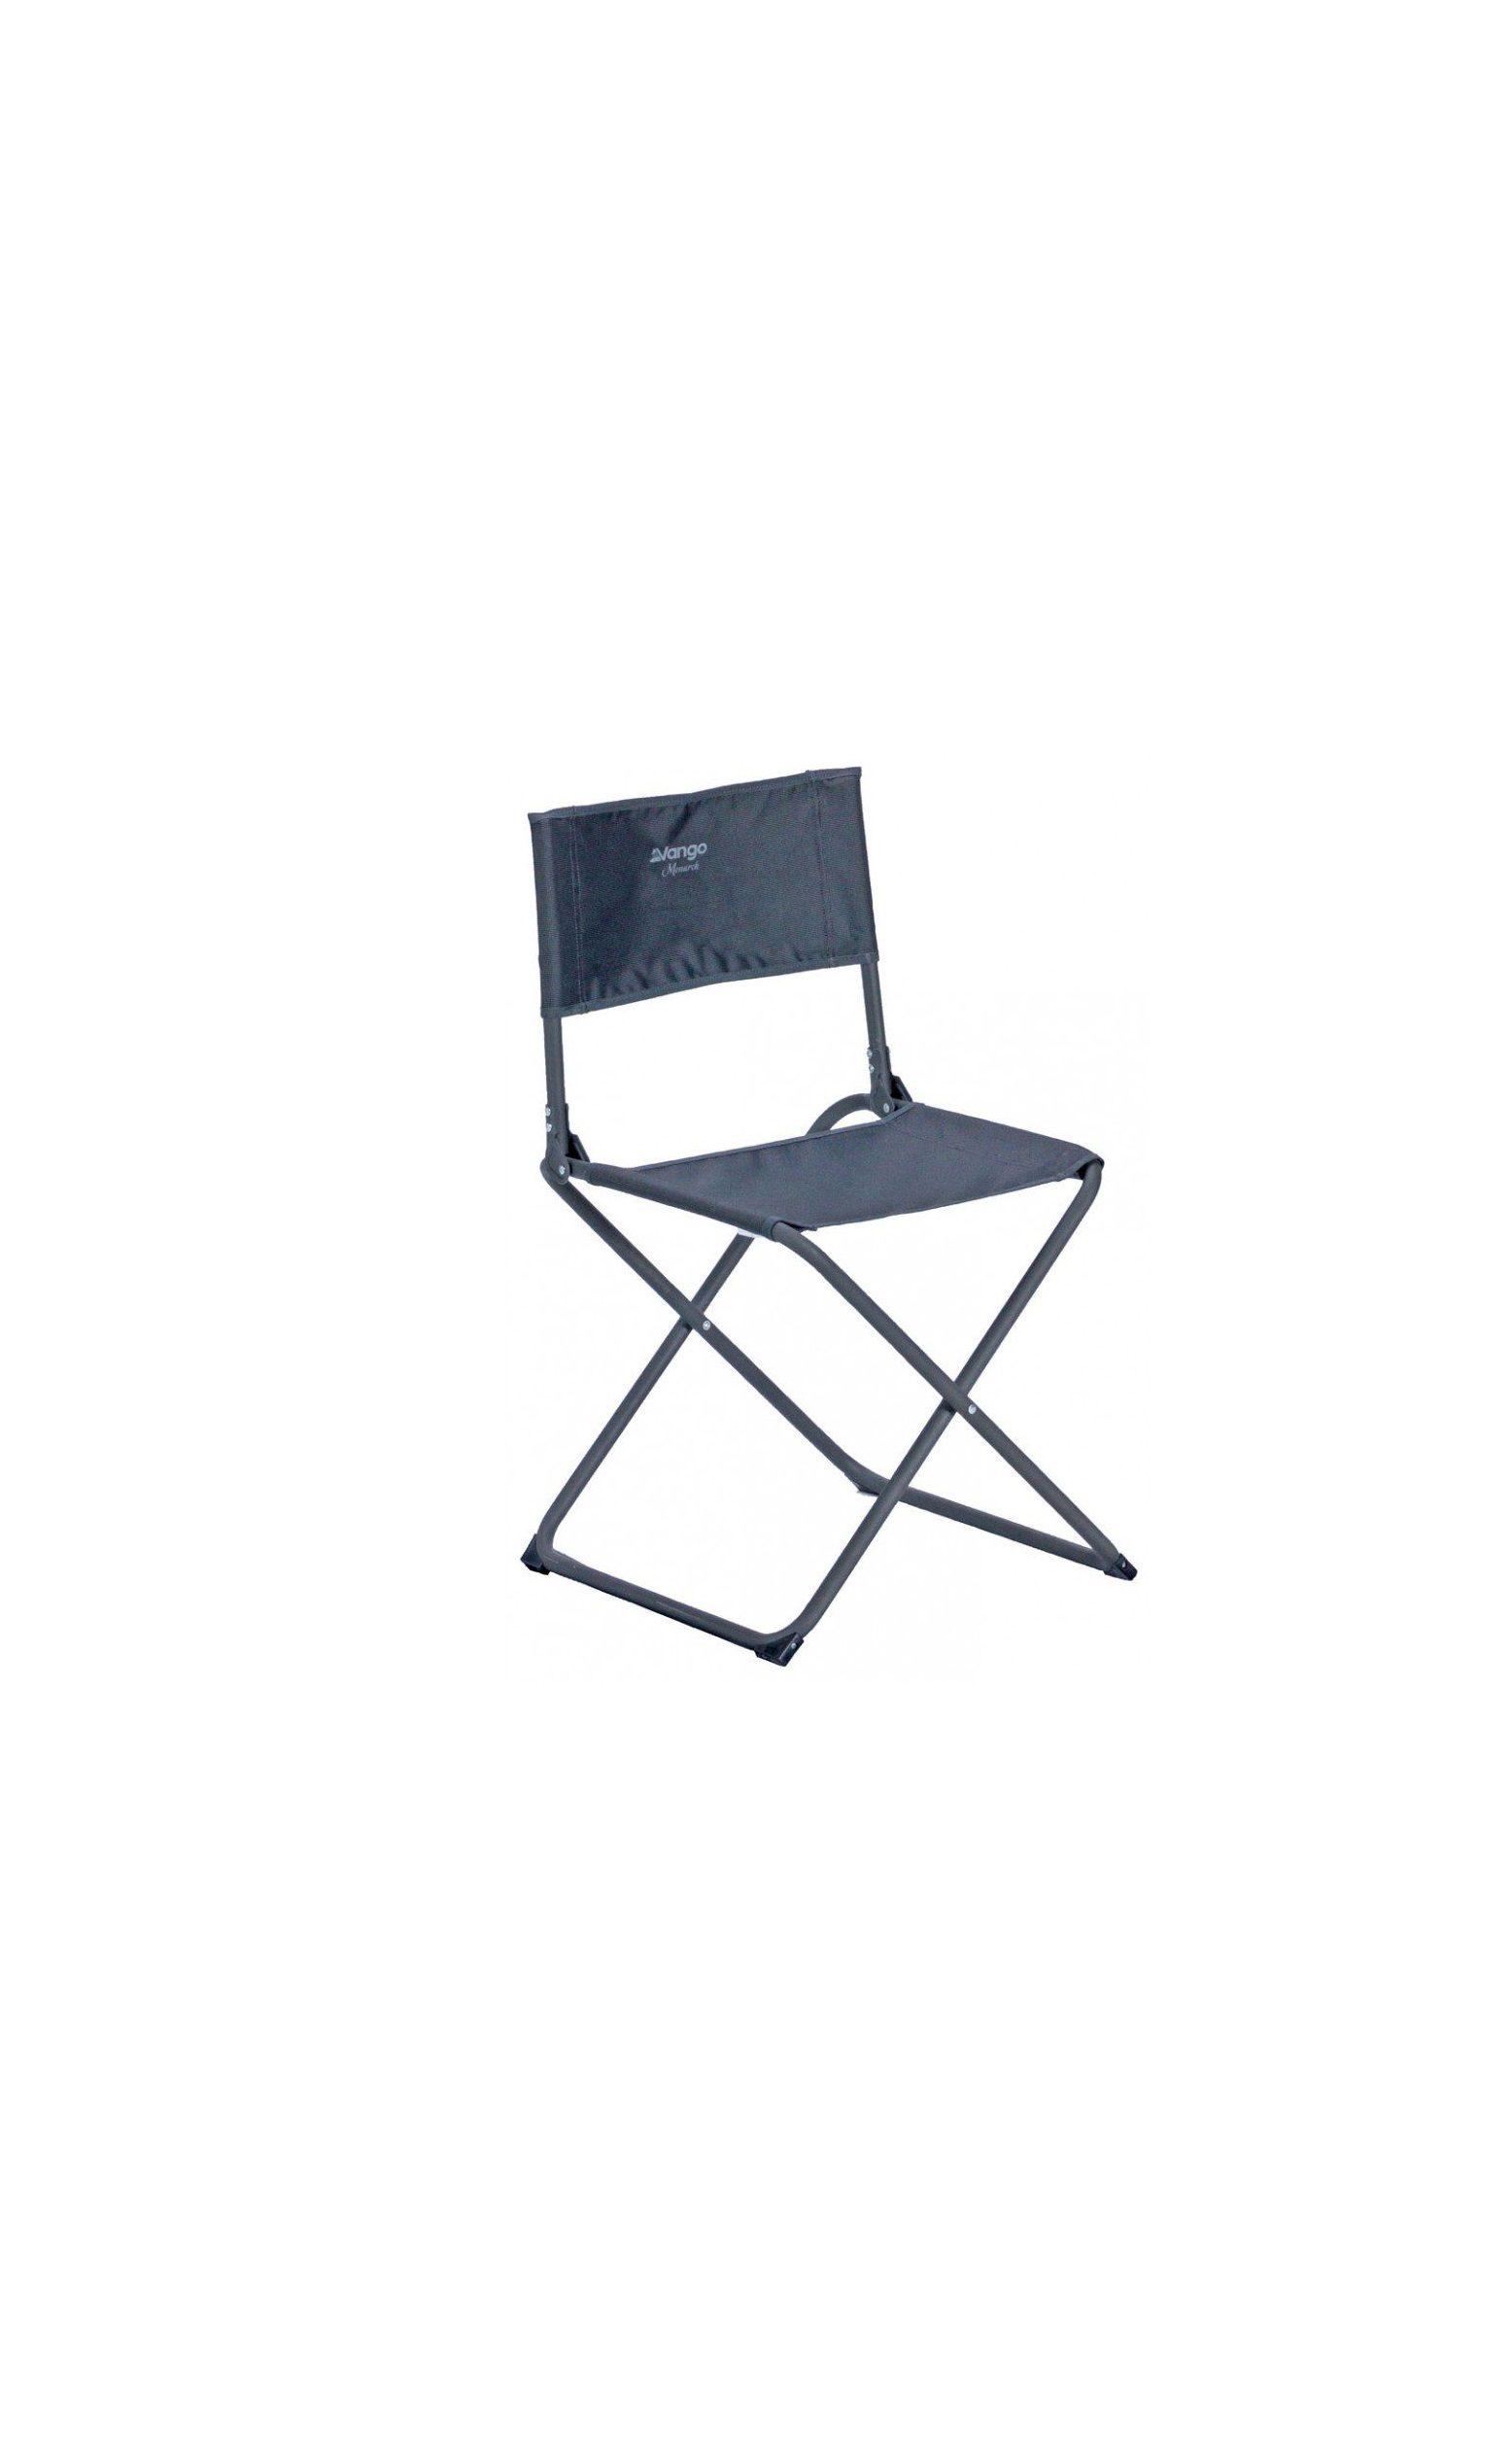 Vango Monarch 2 Folding Chair